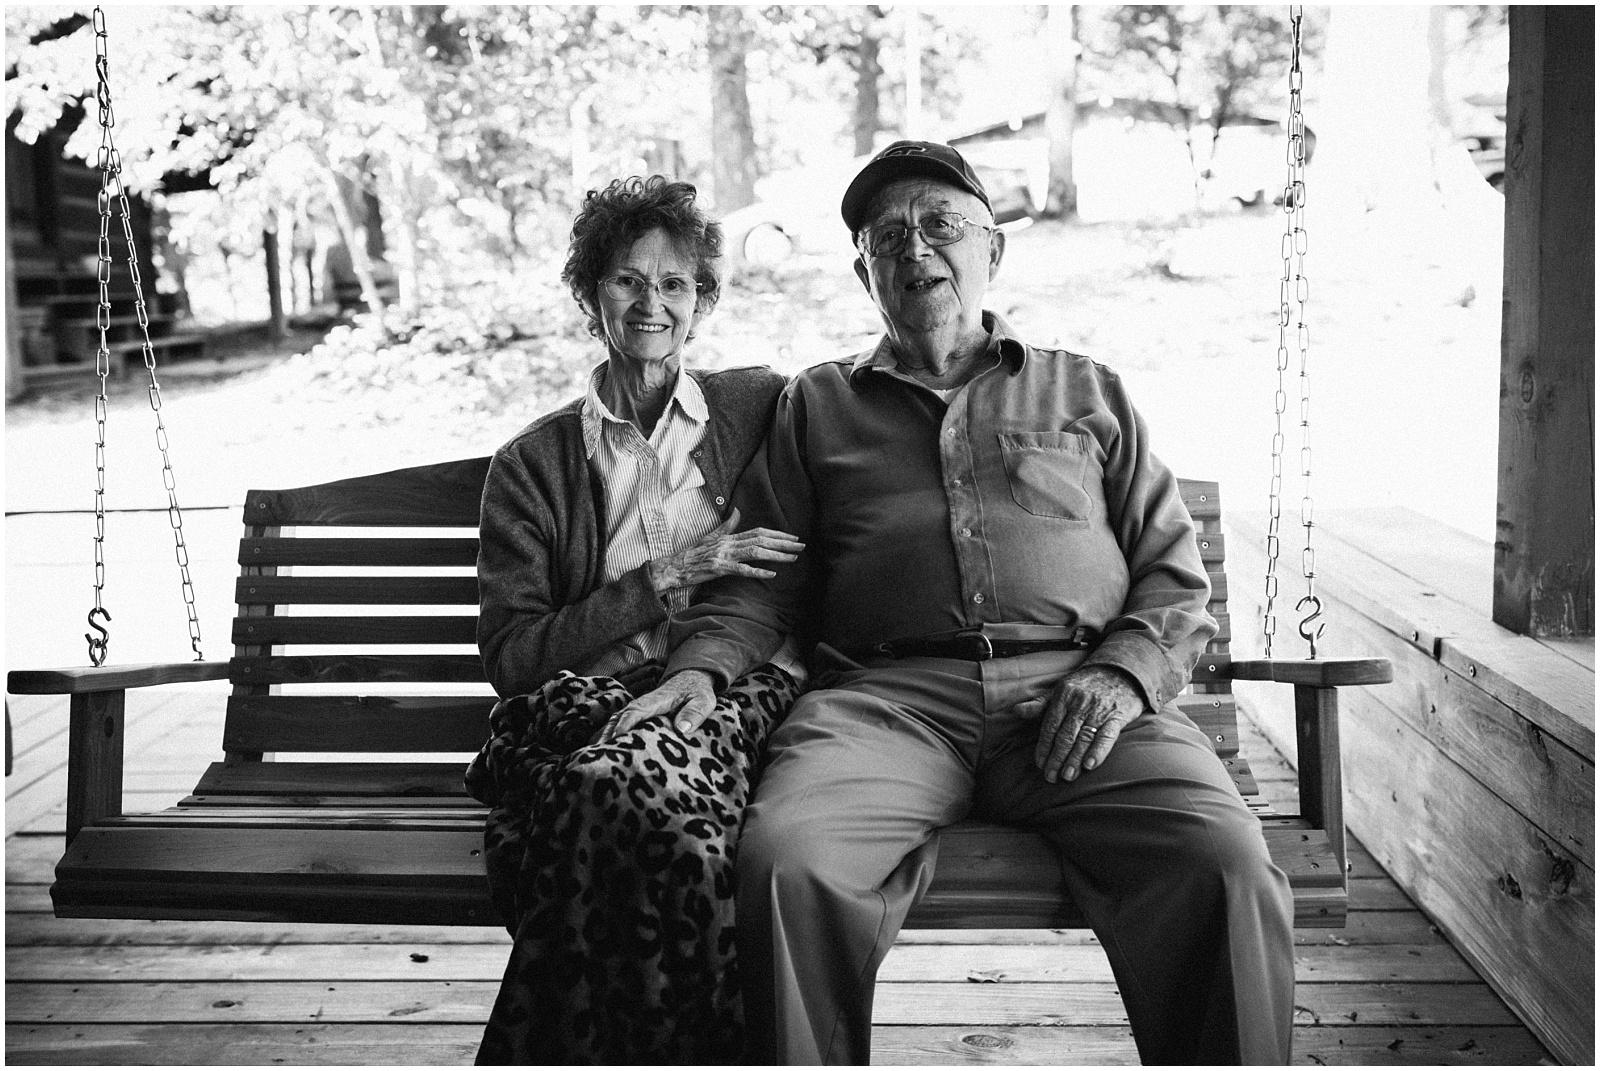 Grandma and granddad portrait on swing